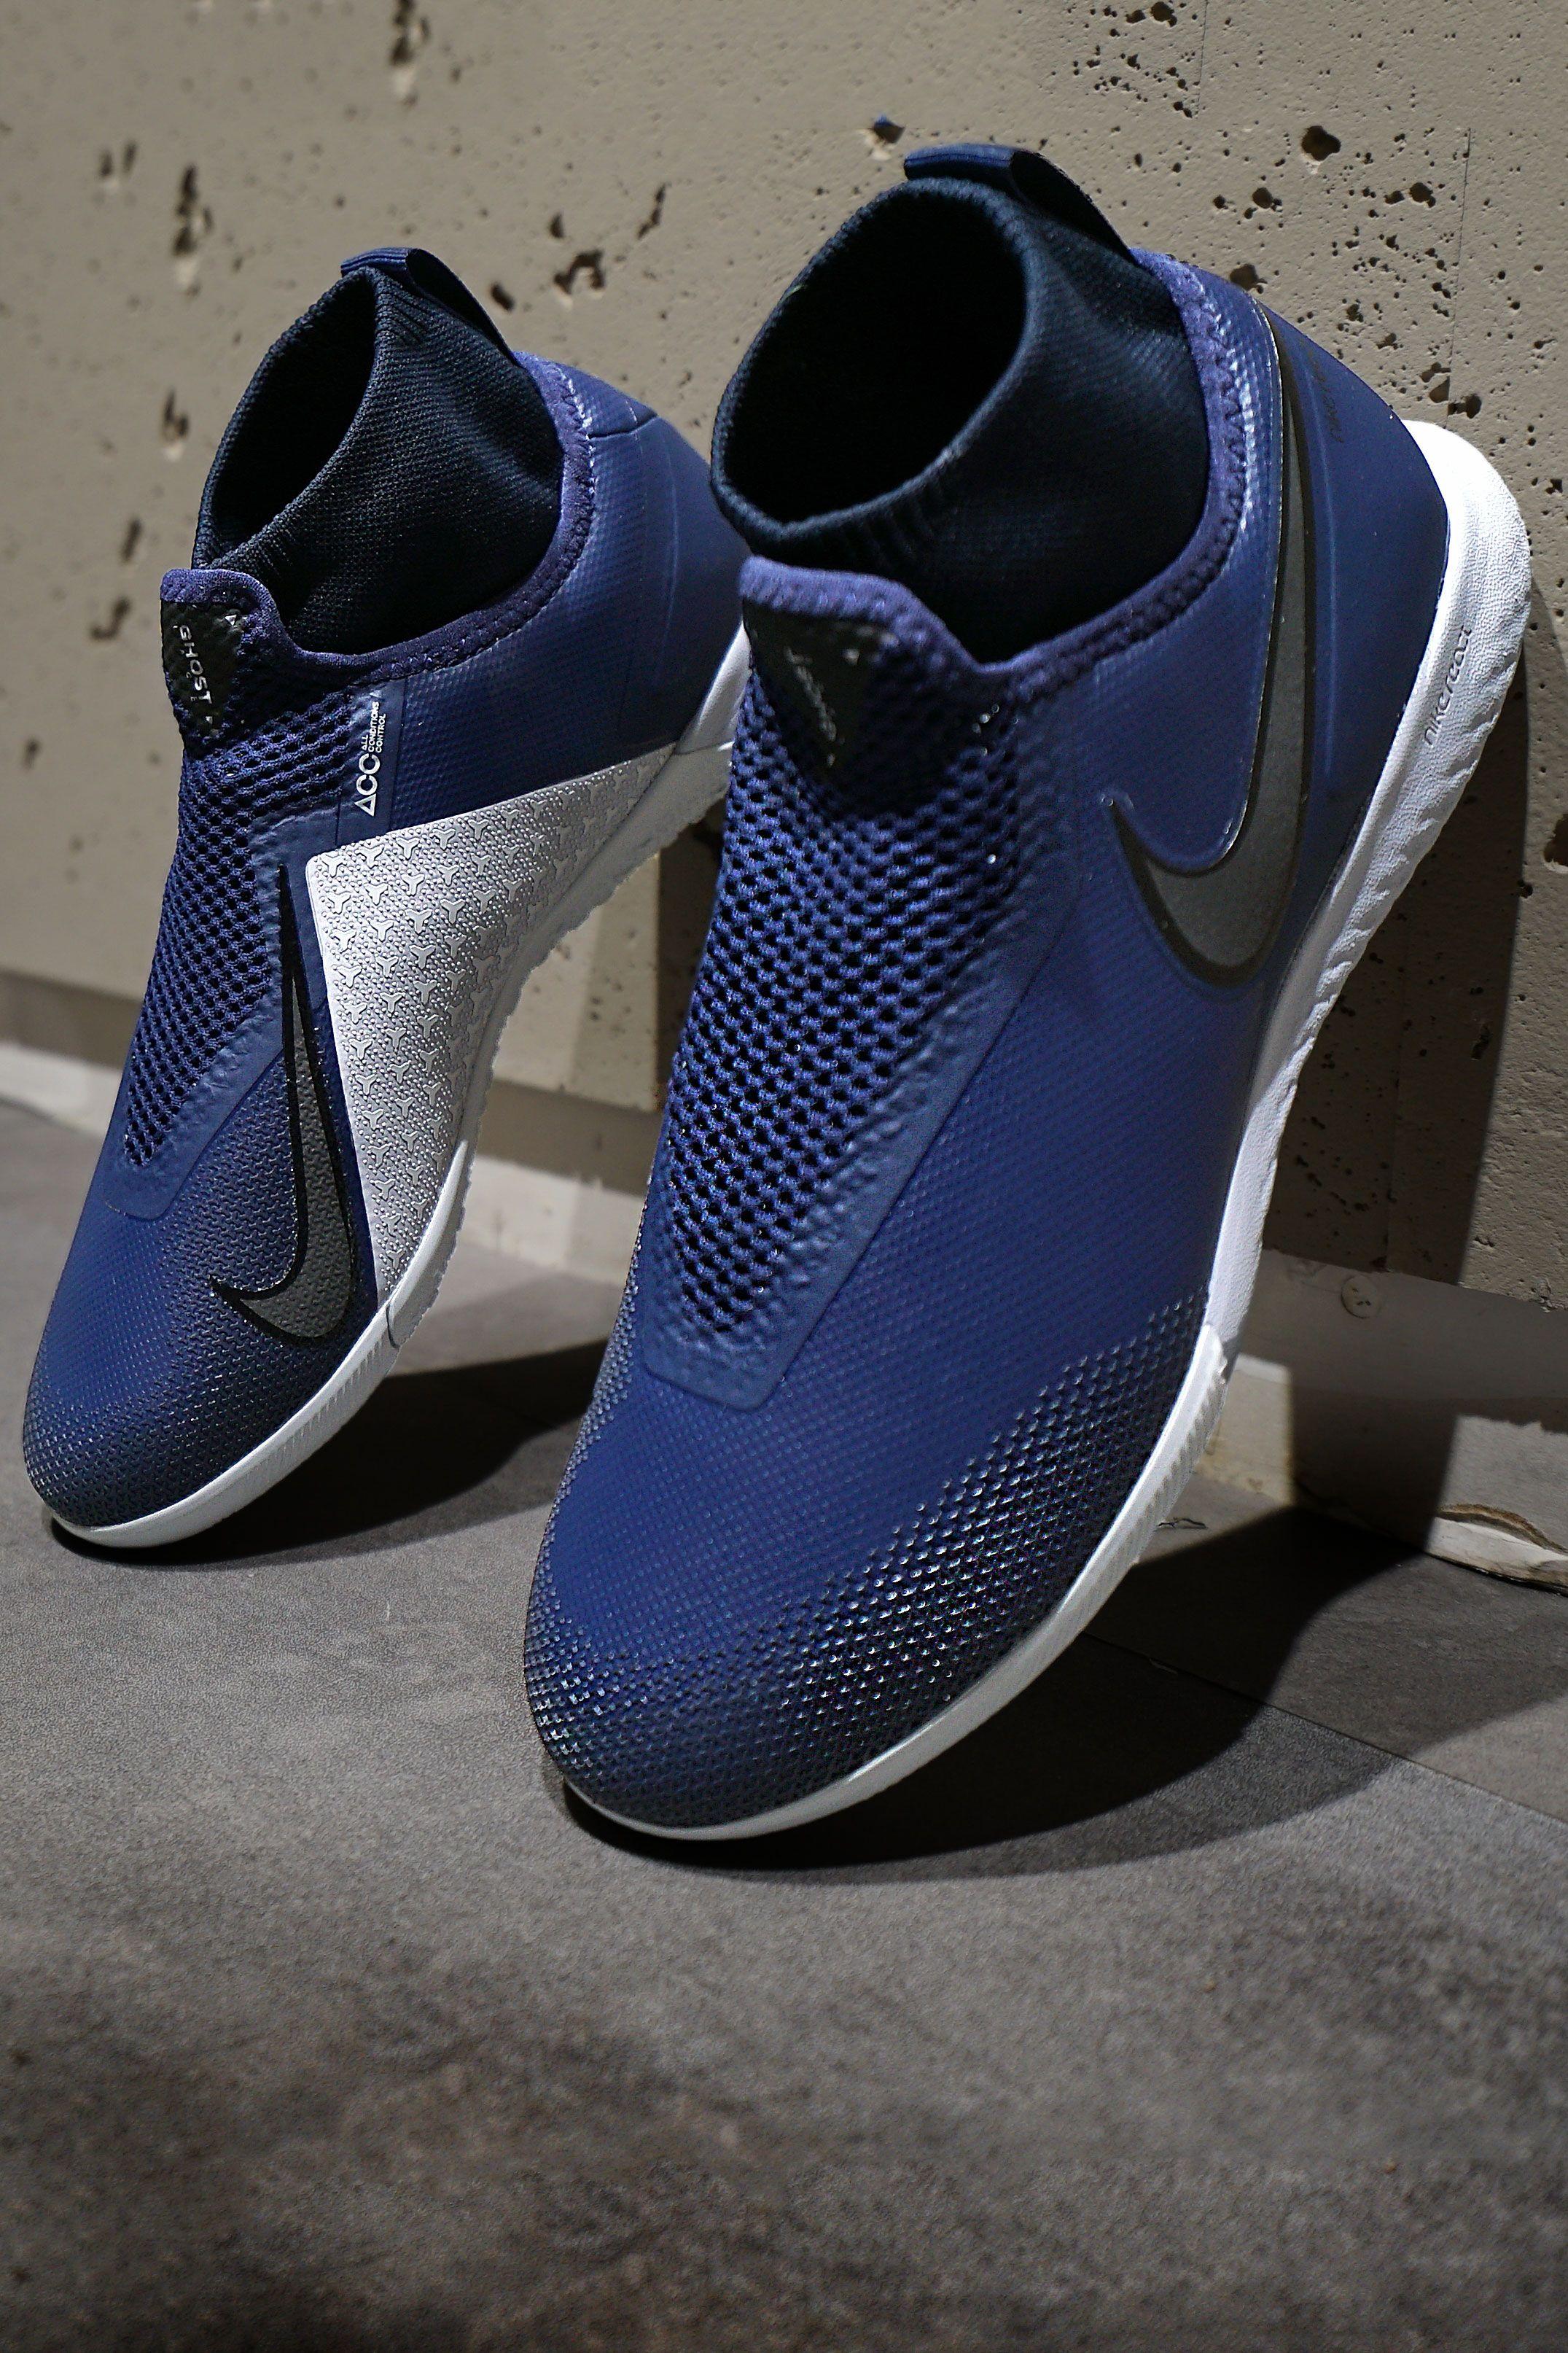 f3edcd655aed0 futbolmaniacom  Edición limitada   🔹 Nike React Phantom Visión Pro para  fútbol sala 🔹 Las